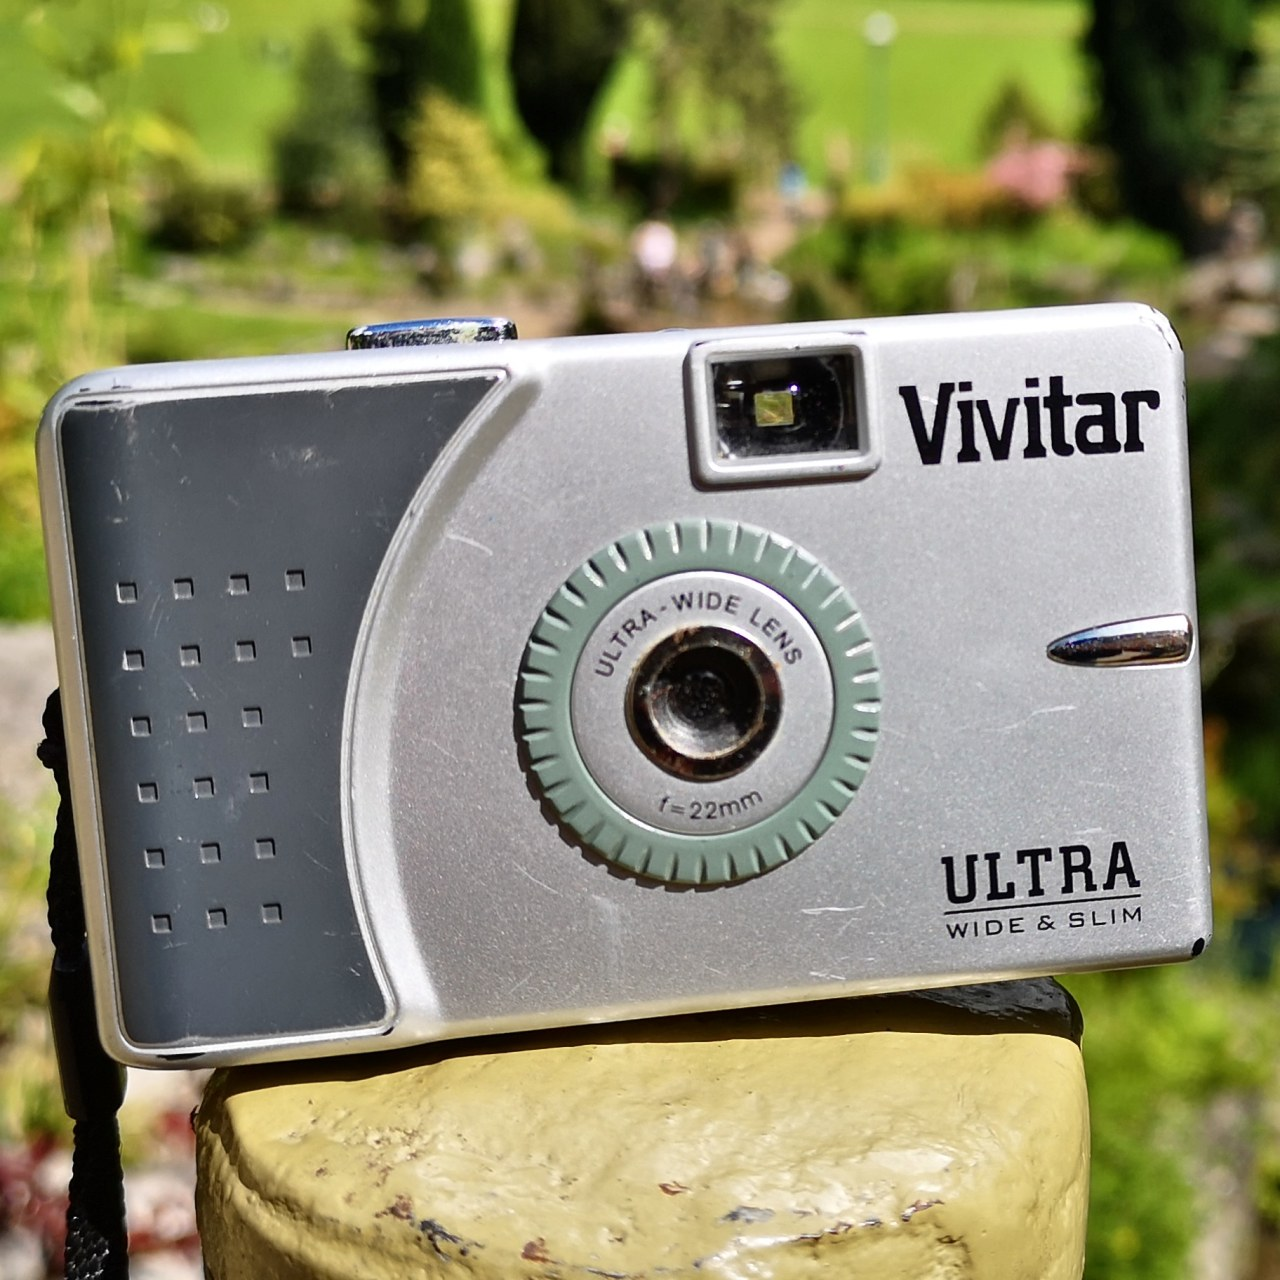 Vivitar UWS (Ultra Wide &Slim)